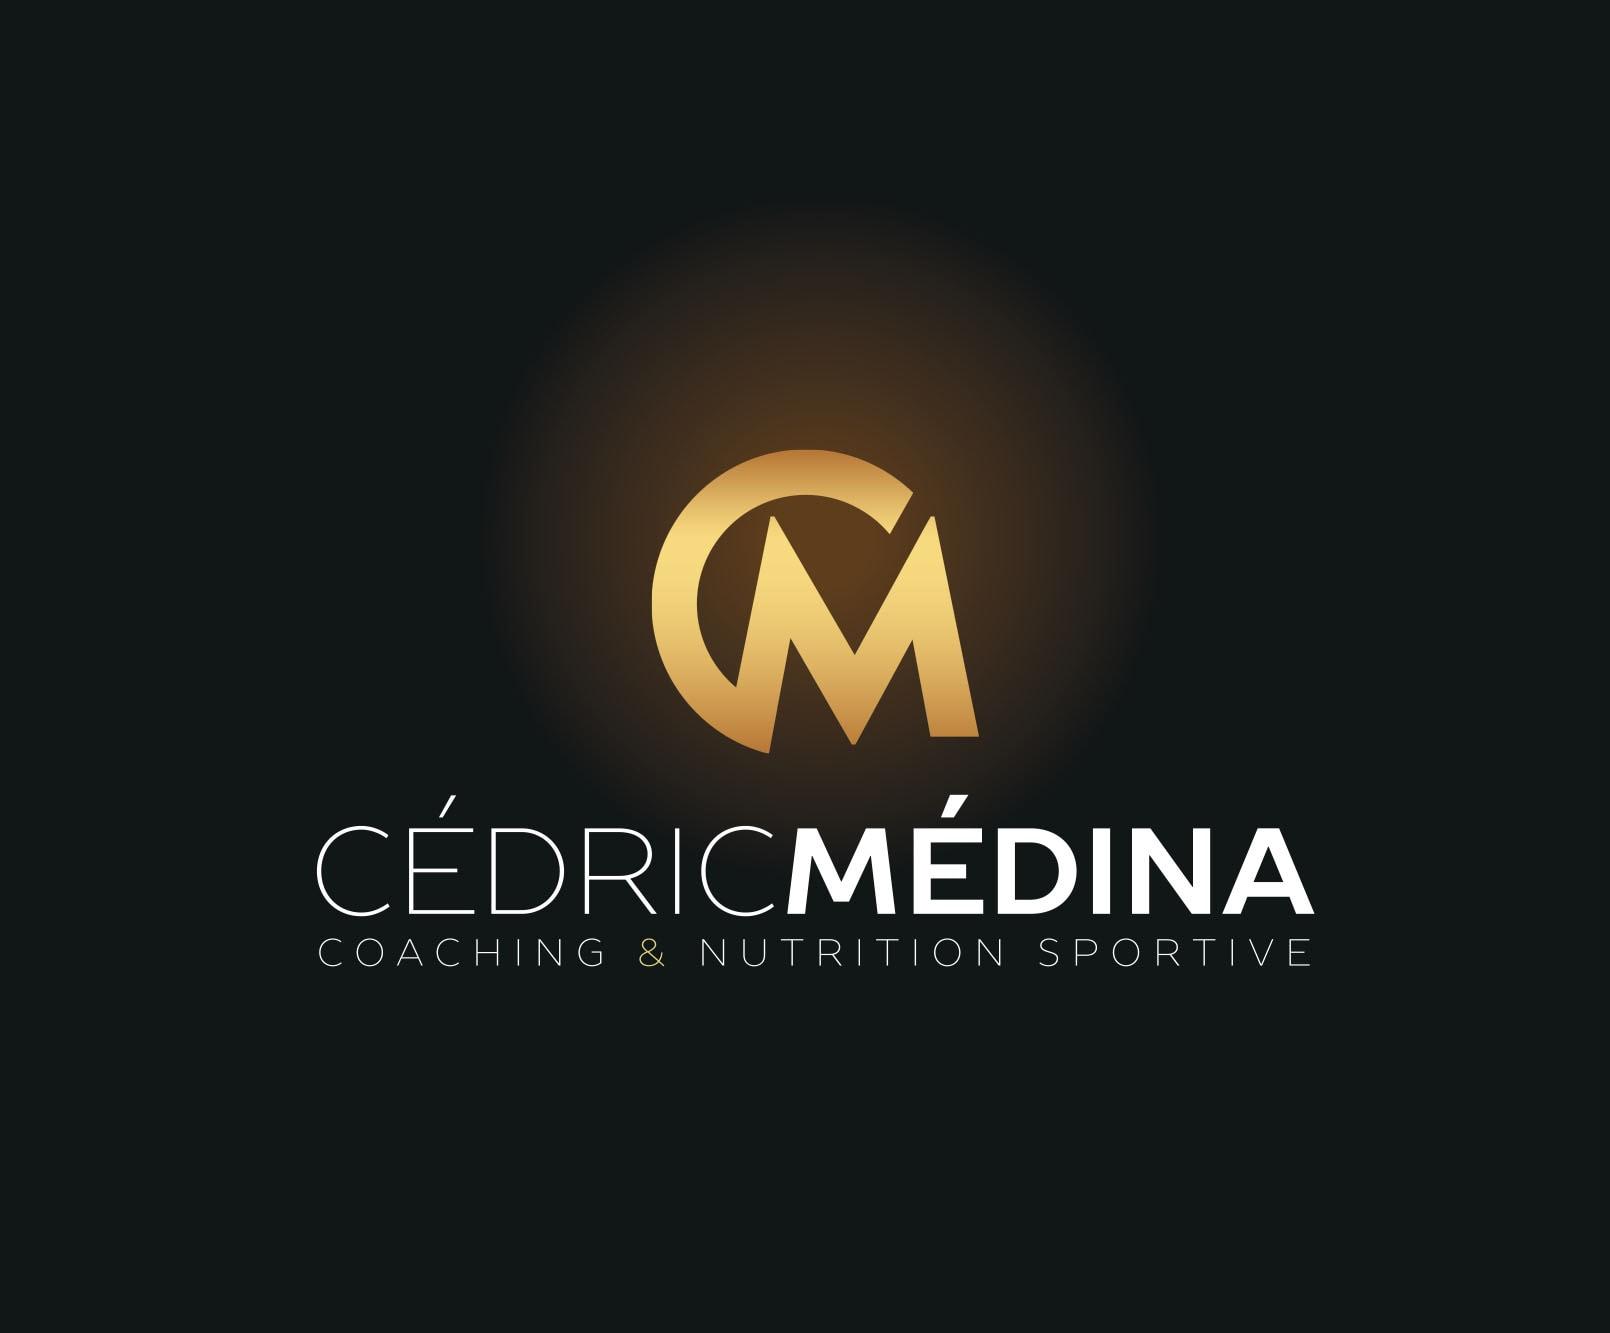 Cédric médina  coach sportif à Bandol 83150